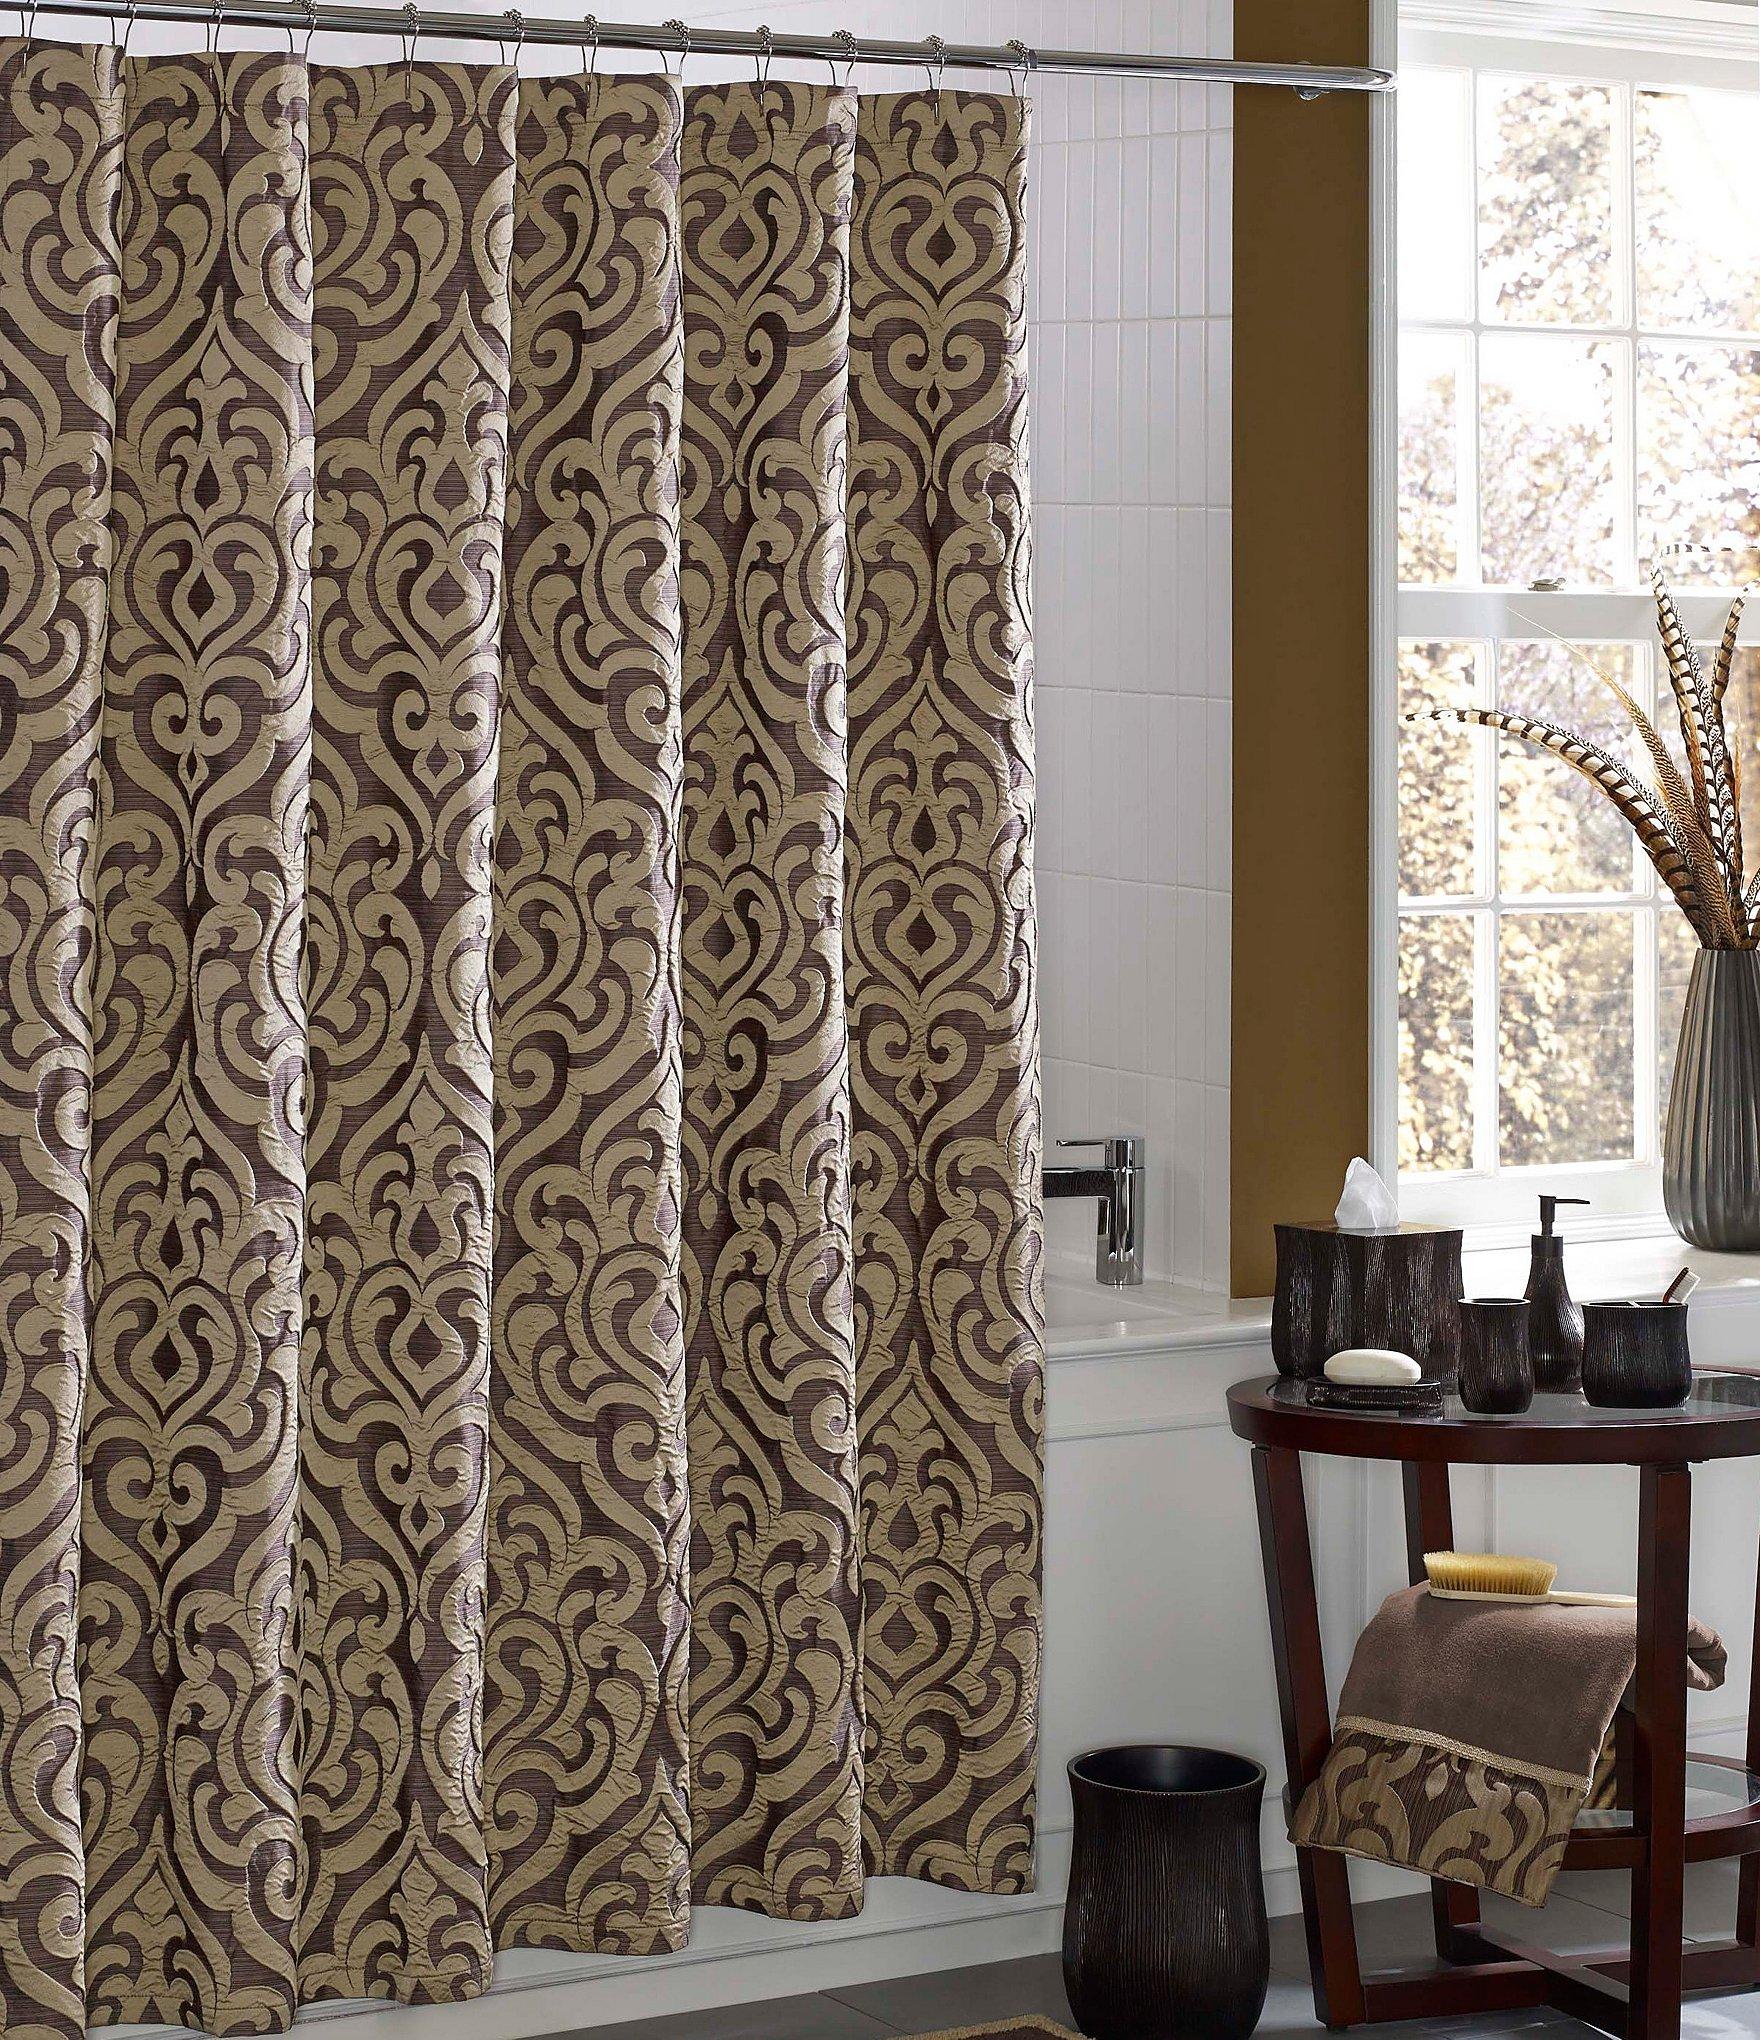 Black and white damask shower curtain - Black And White Damask Shower Curtain 55